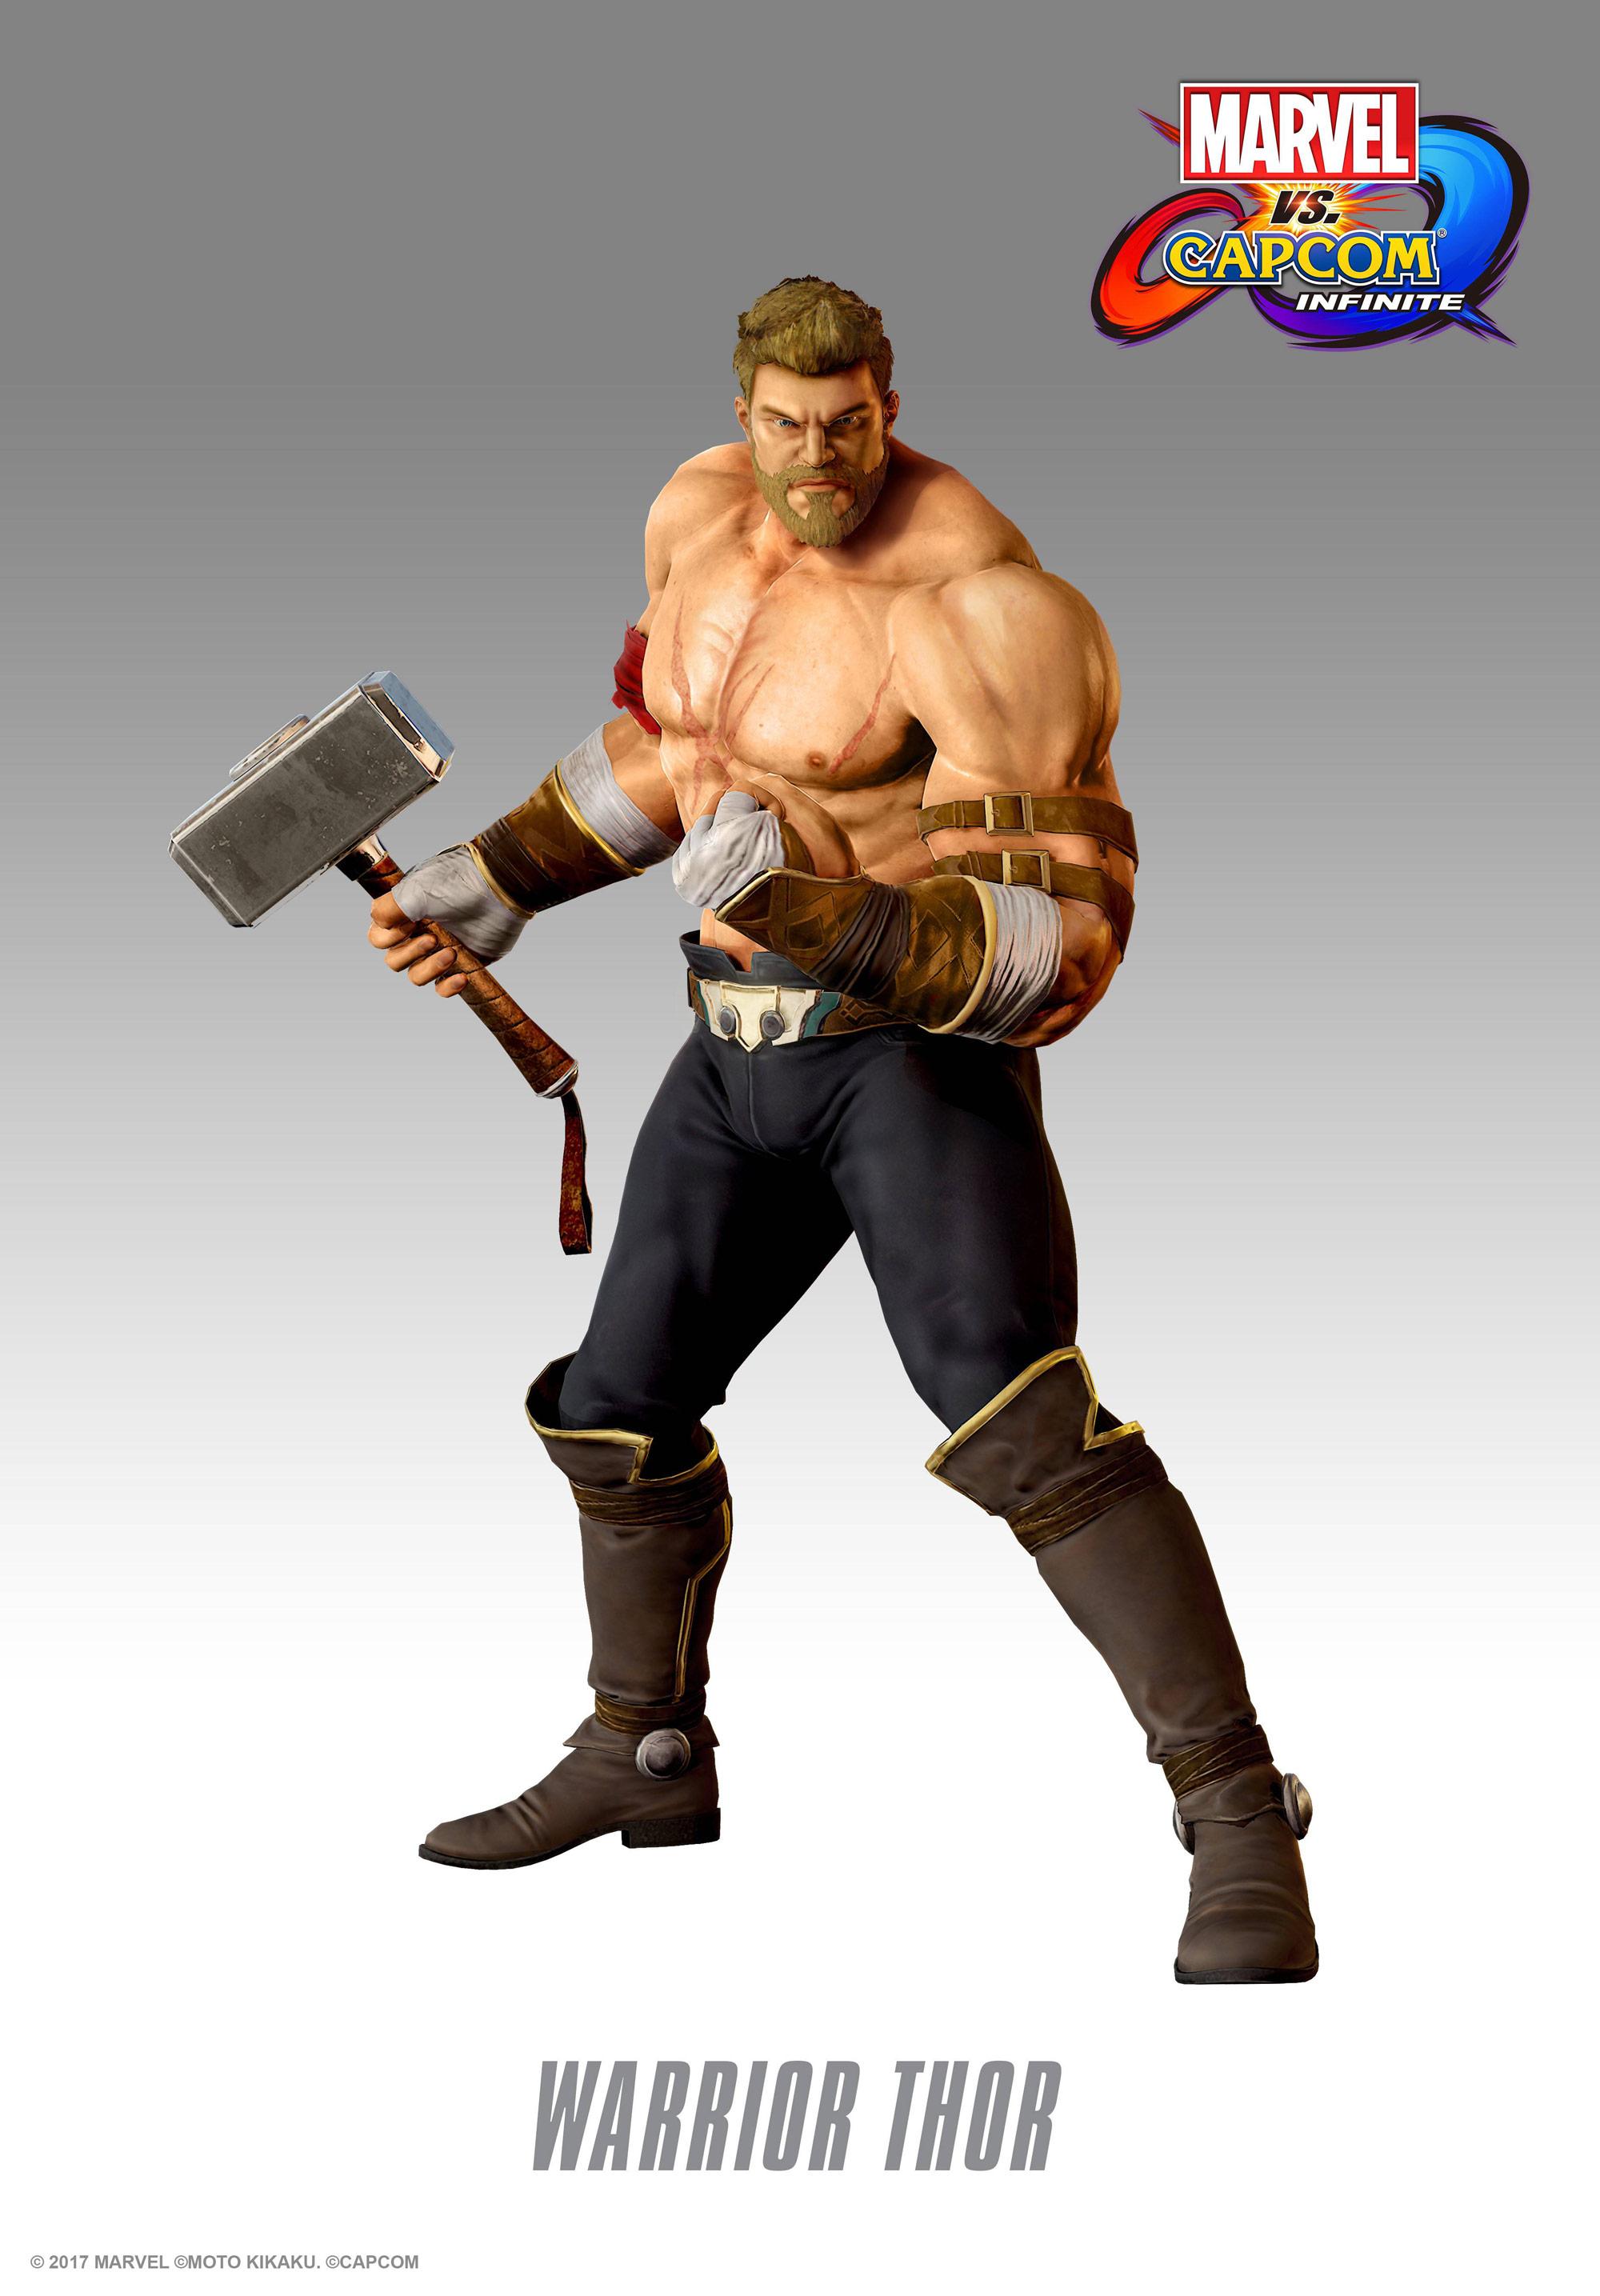 Marvel vs. Capcom: Infinite premium costumes for Mega Man, Ryu, Thor and Hulk 3 out of 4 image gallery